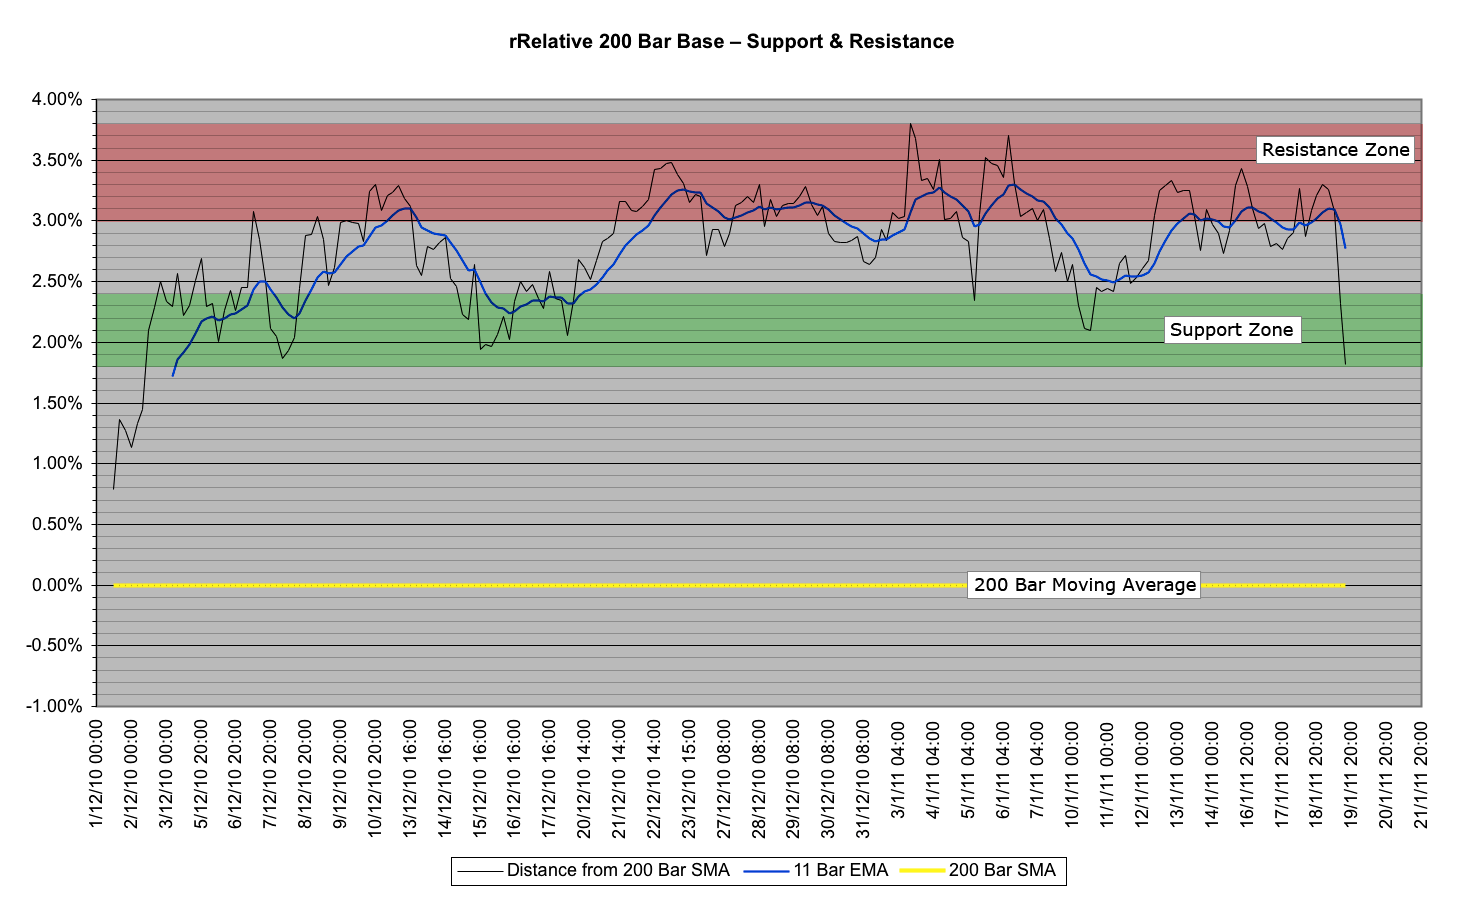 rrelative-support-resistance2.png